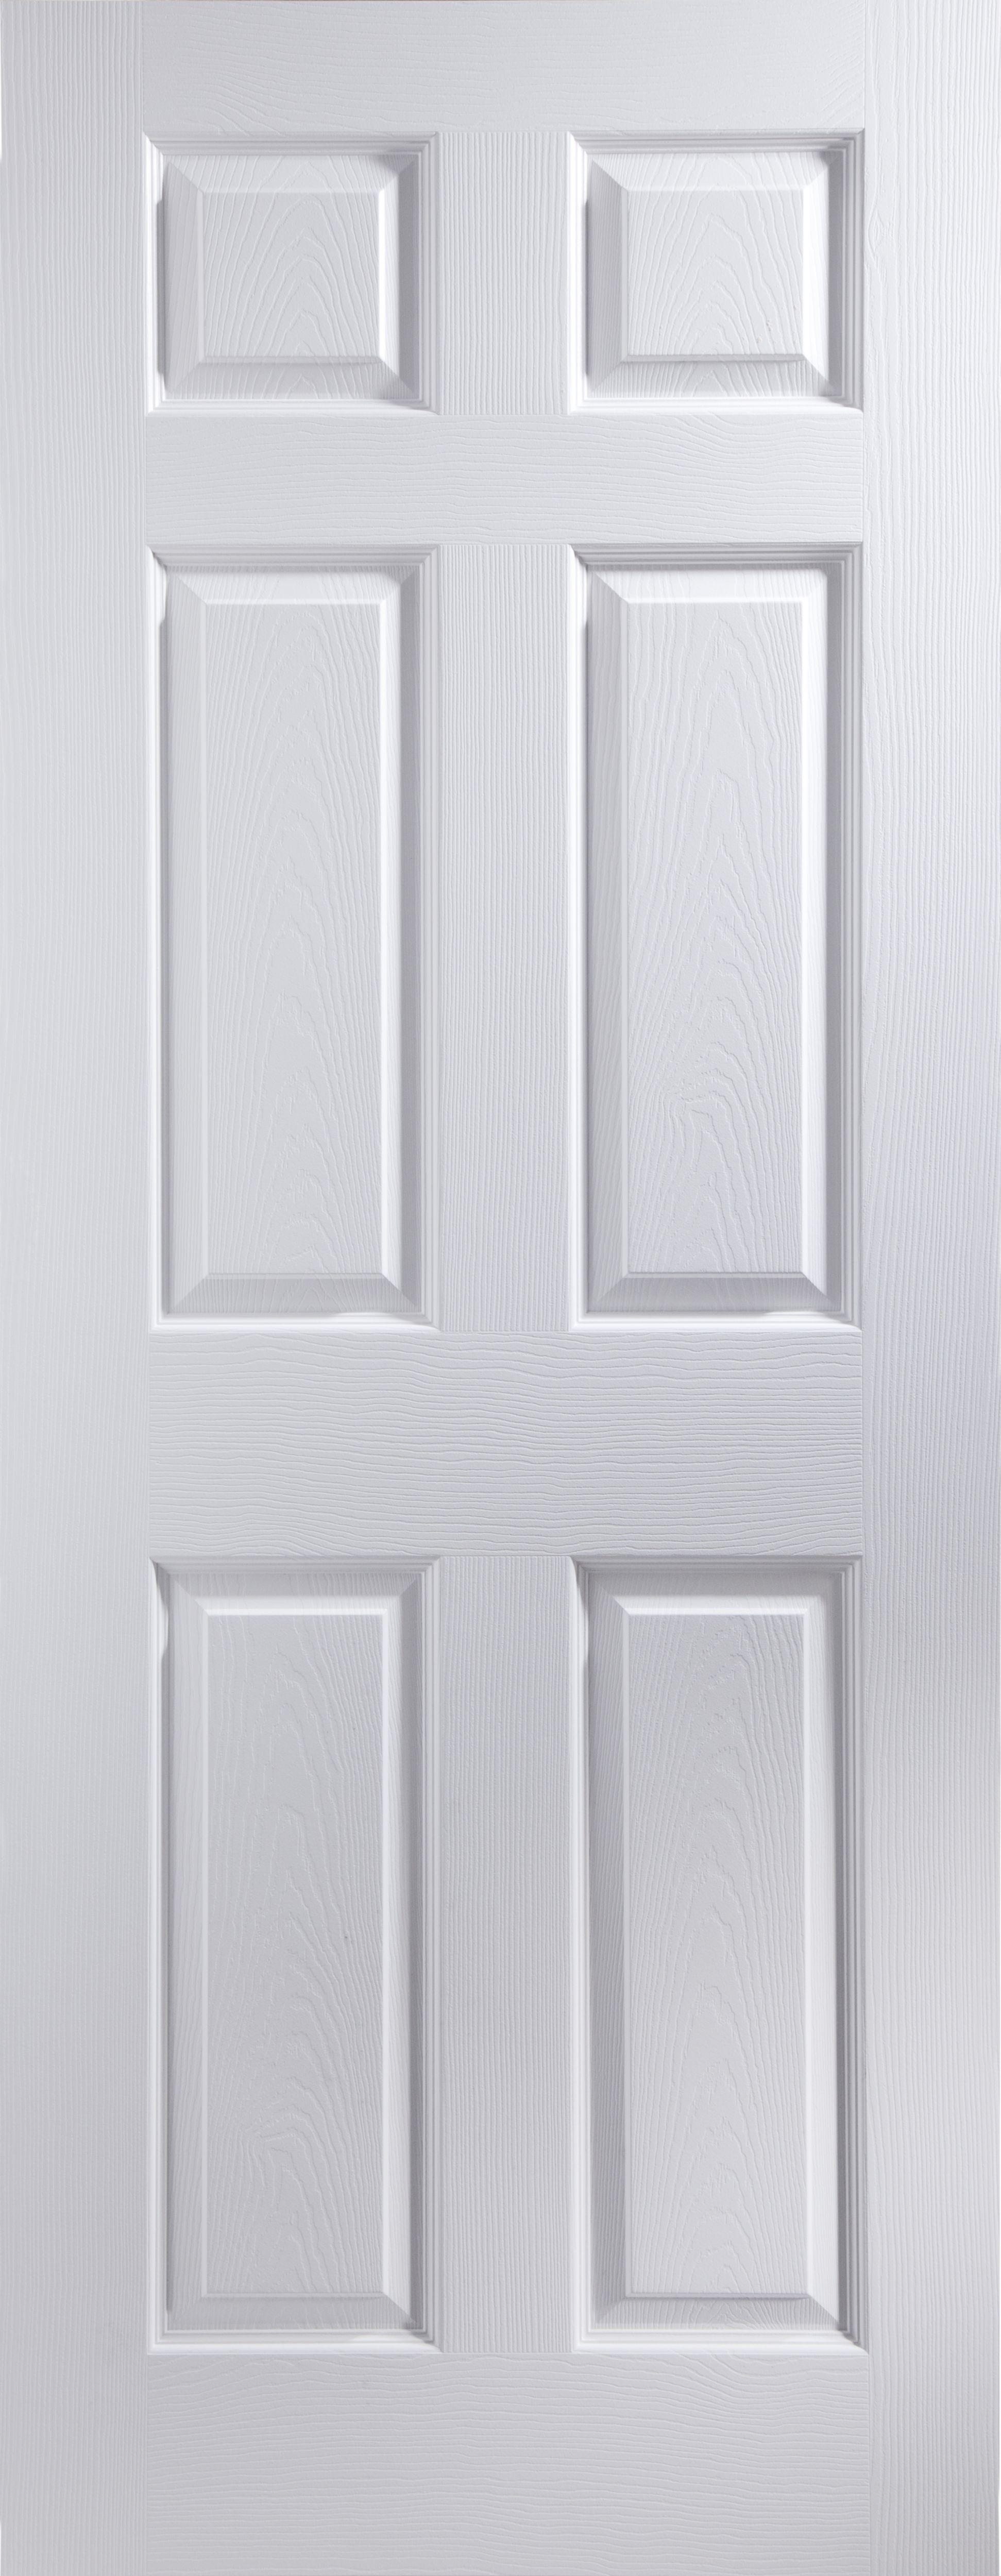 6 Panel PrePainted White Unglazed Internal Standard Door H